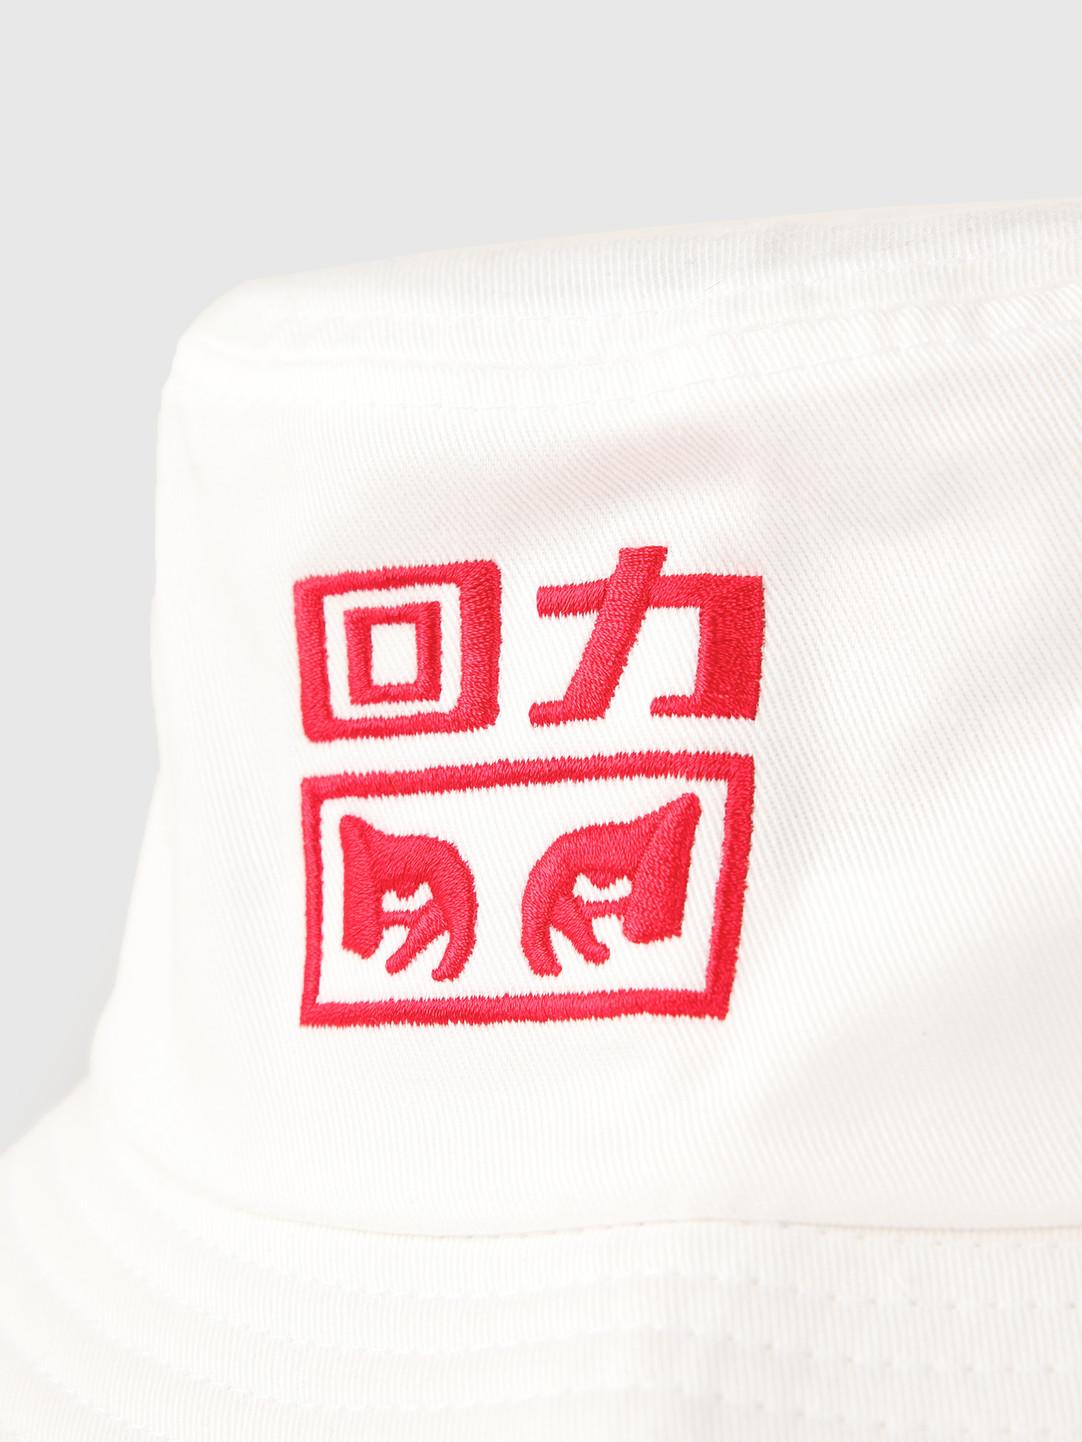 Obey Obey x Warrior Bucket Hat White 100520031E-WHT